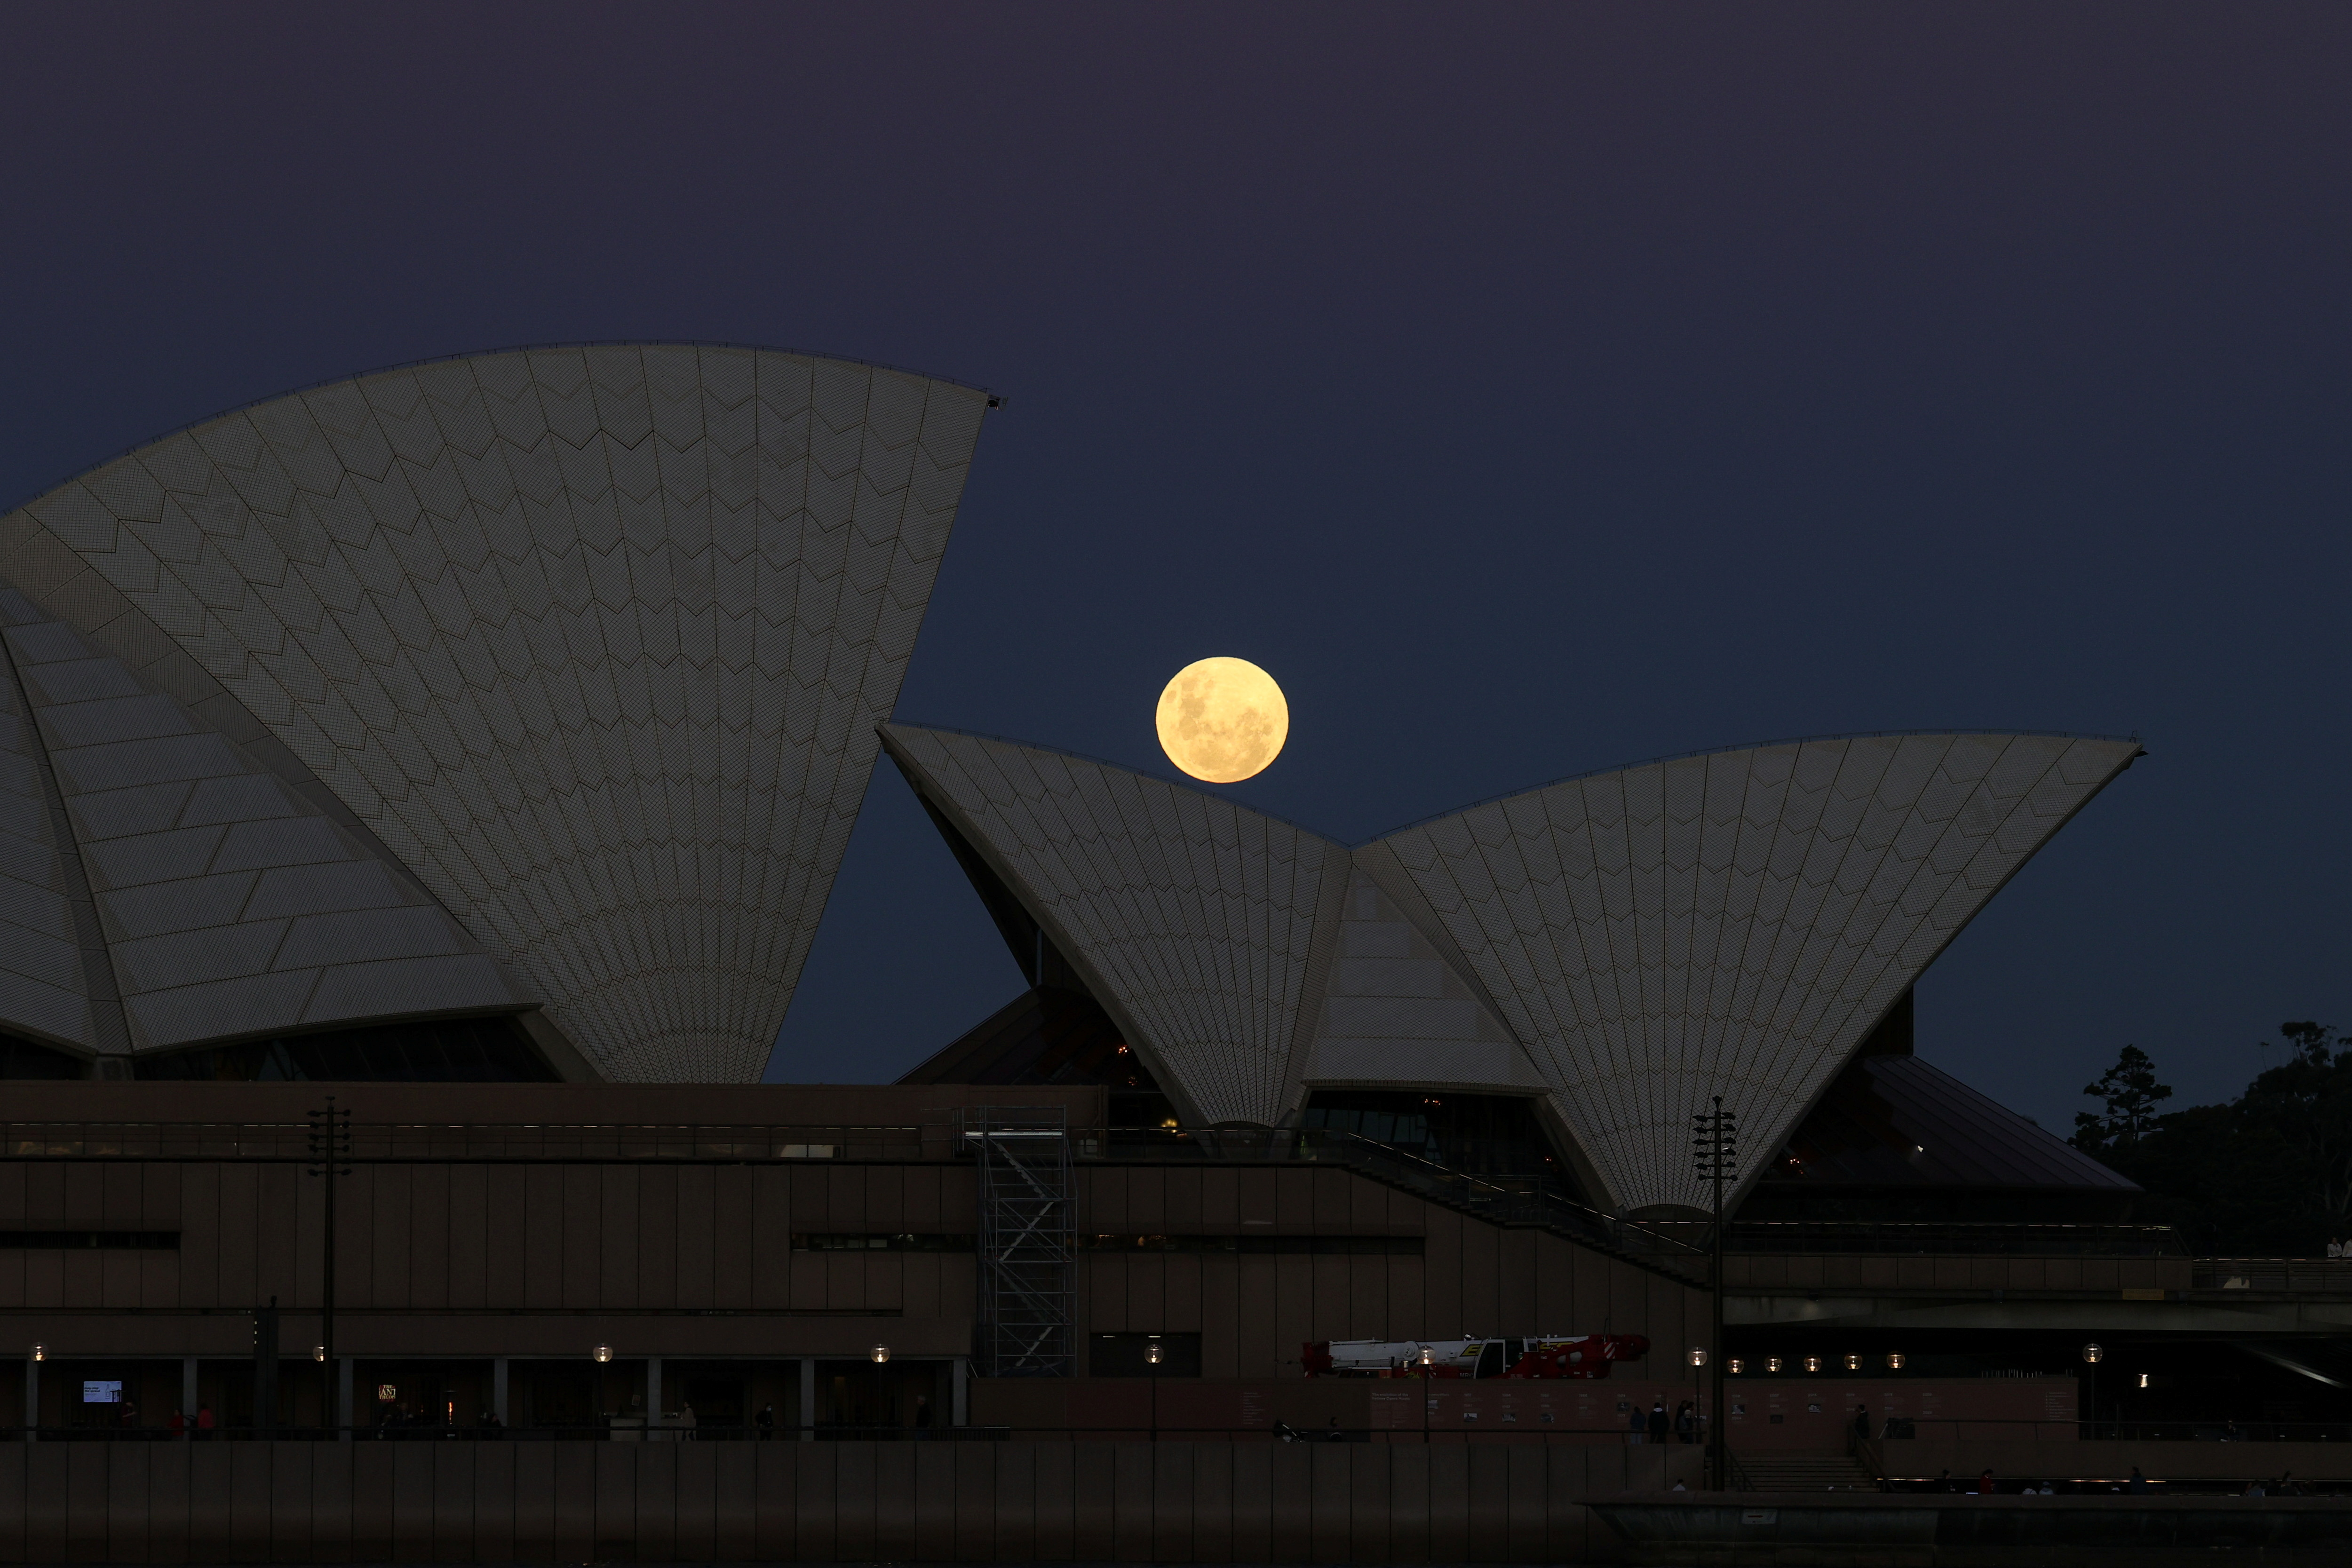 A Super Flower Moon rises behind the Sydney Opera House on the night of a lunar eclipse, in Sydney, Australia, May 26, 2021.  REUTERS/Loren Elliott